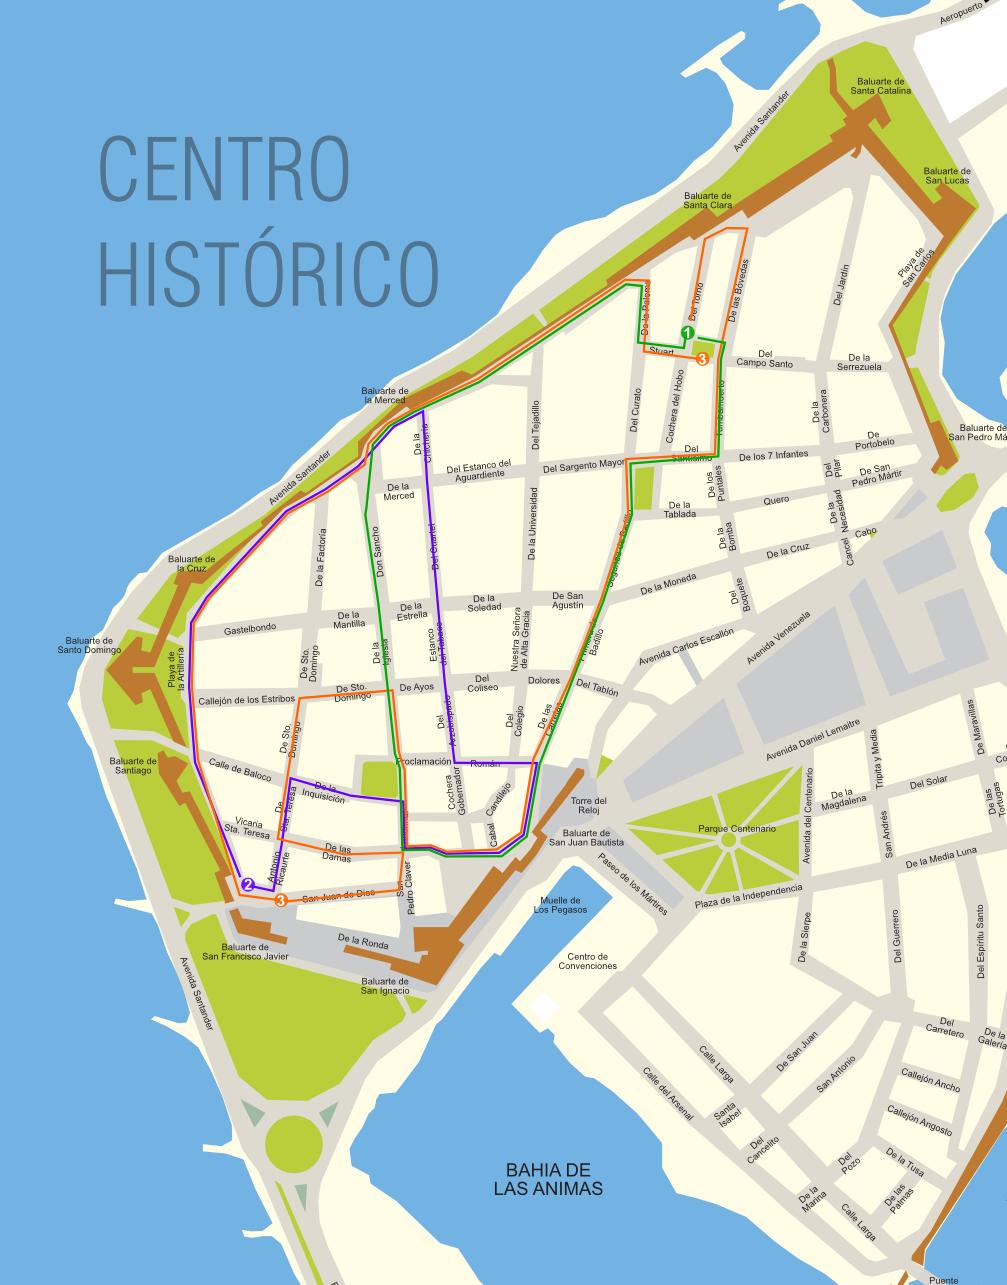 Paseo En Coche Cartagena De Indias - Cartagena de indias map